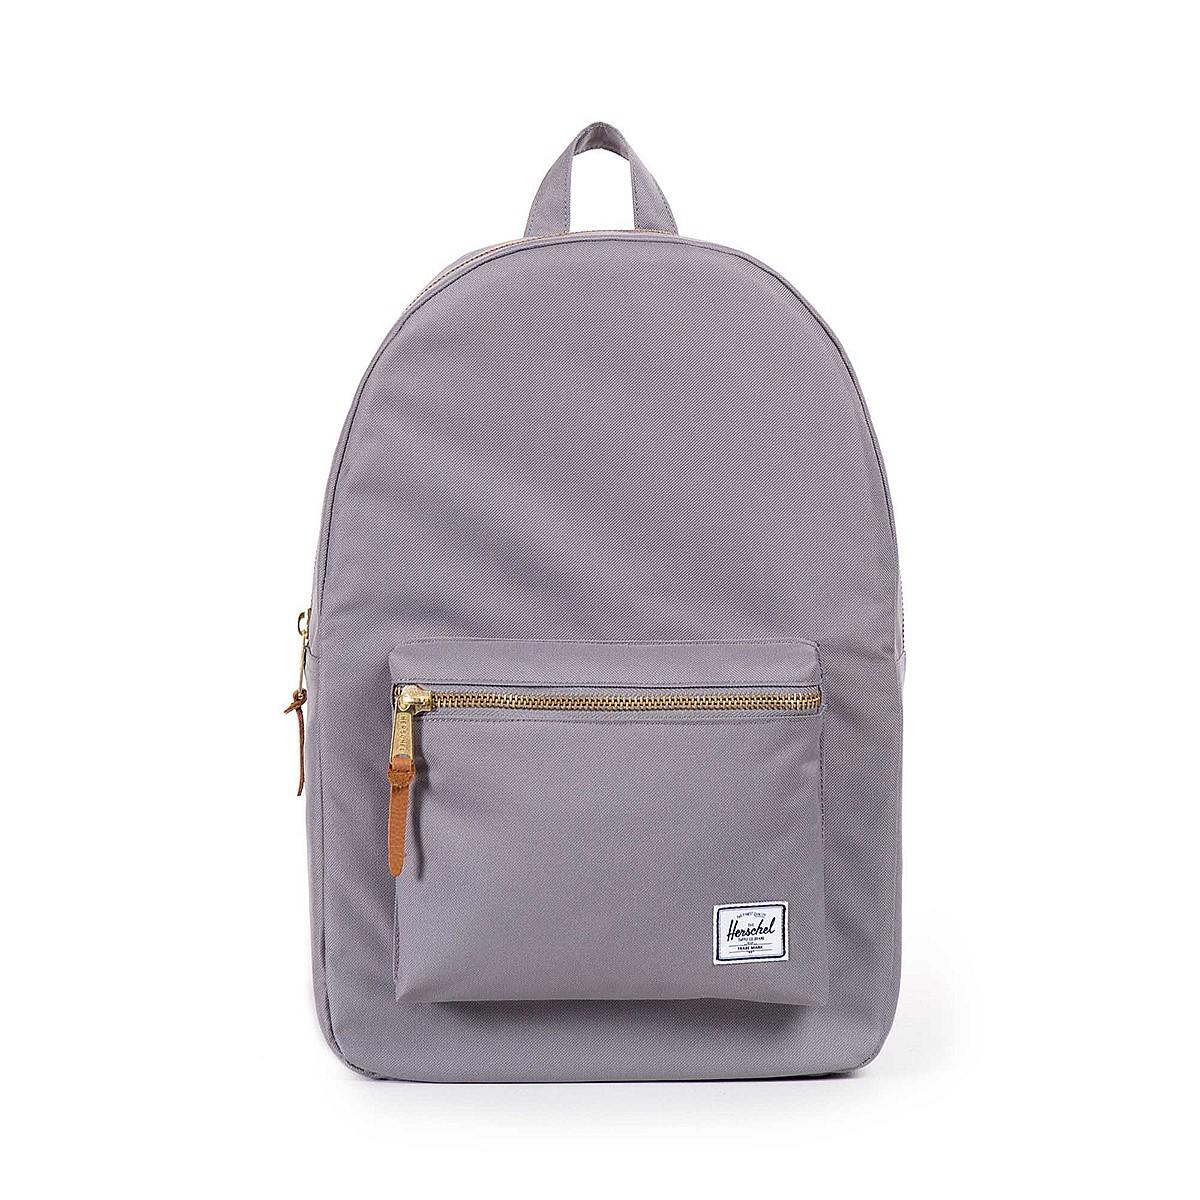 5f20bd86f9e Men s Wallets   Bags Online